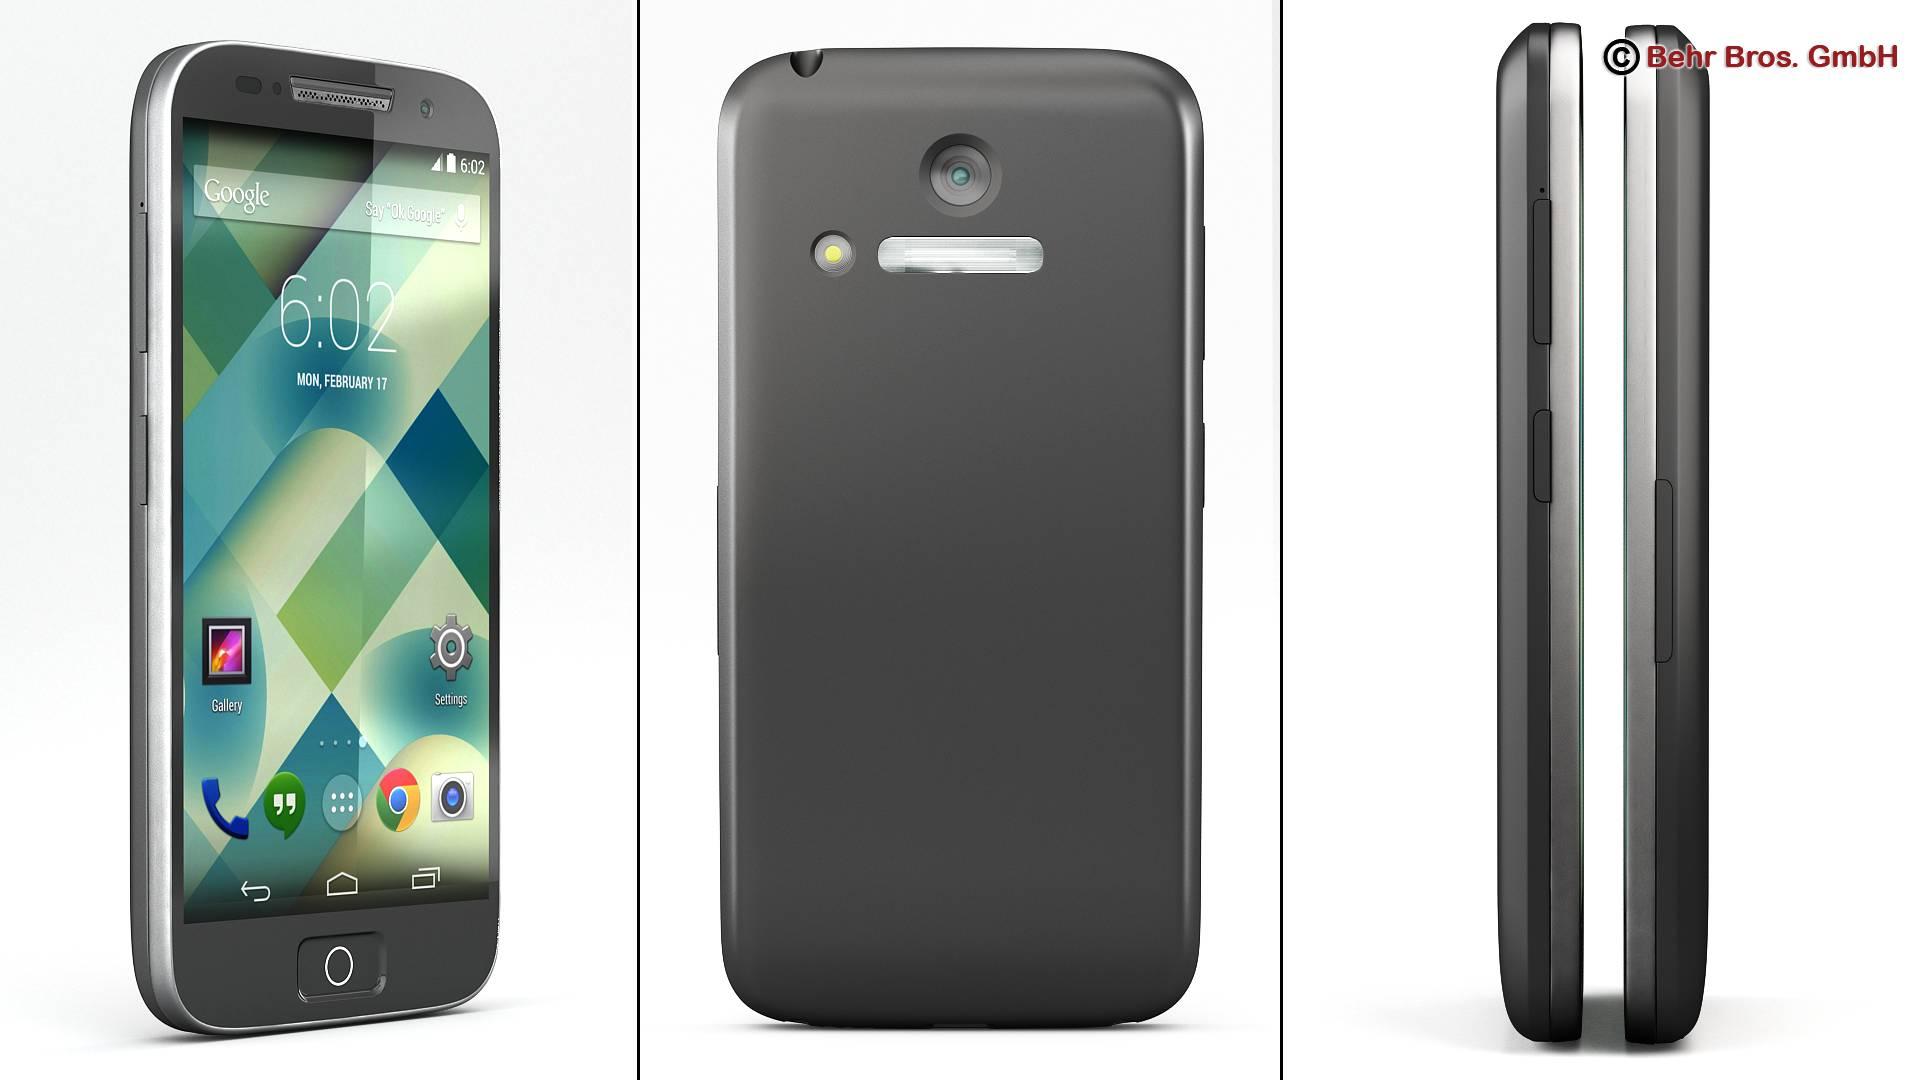 generic smartphone 4 inch 3d model 3ds max fbx c4d lwo ma mb obj 161623